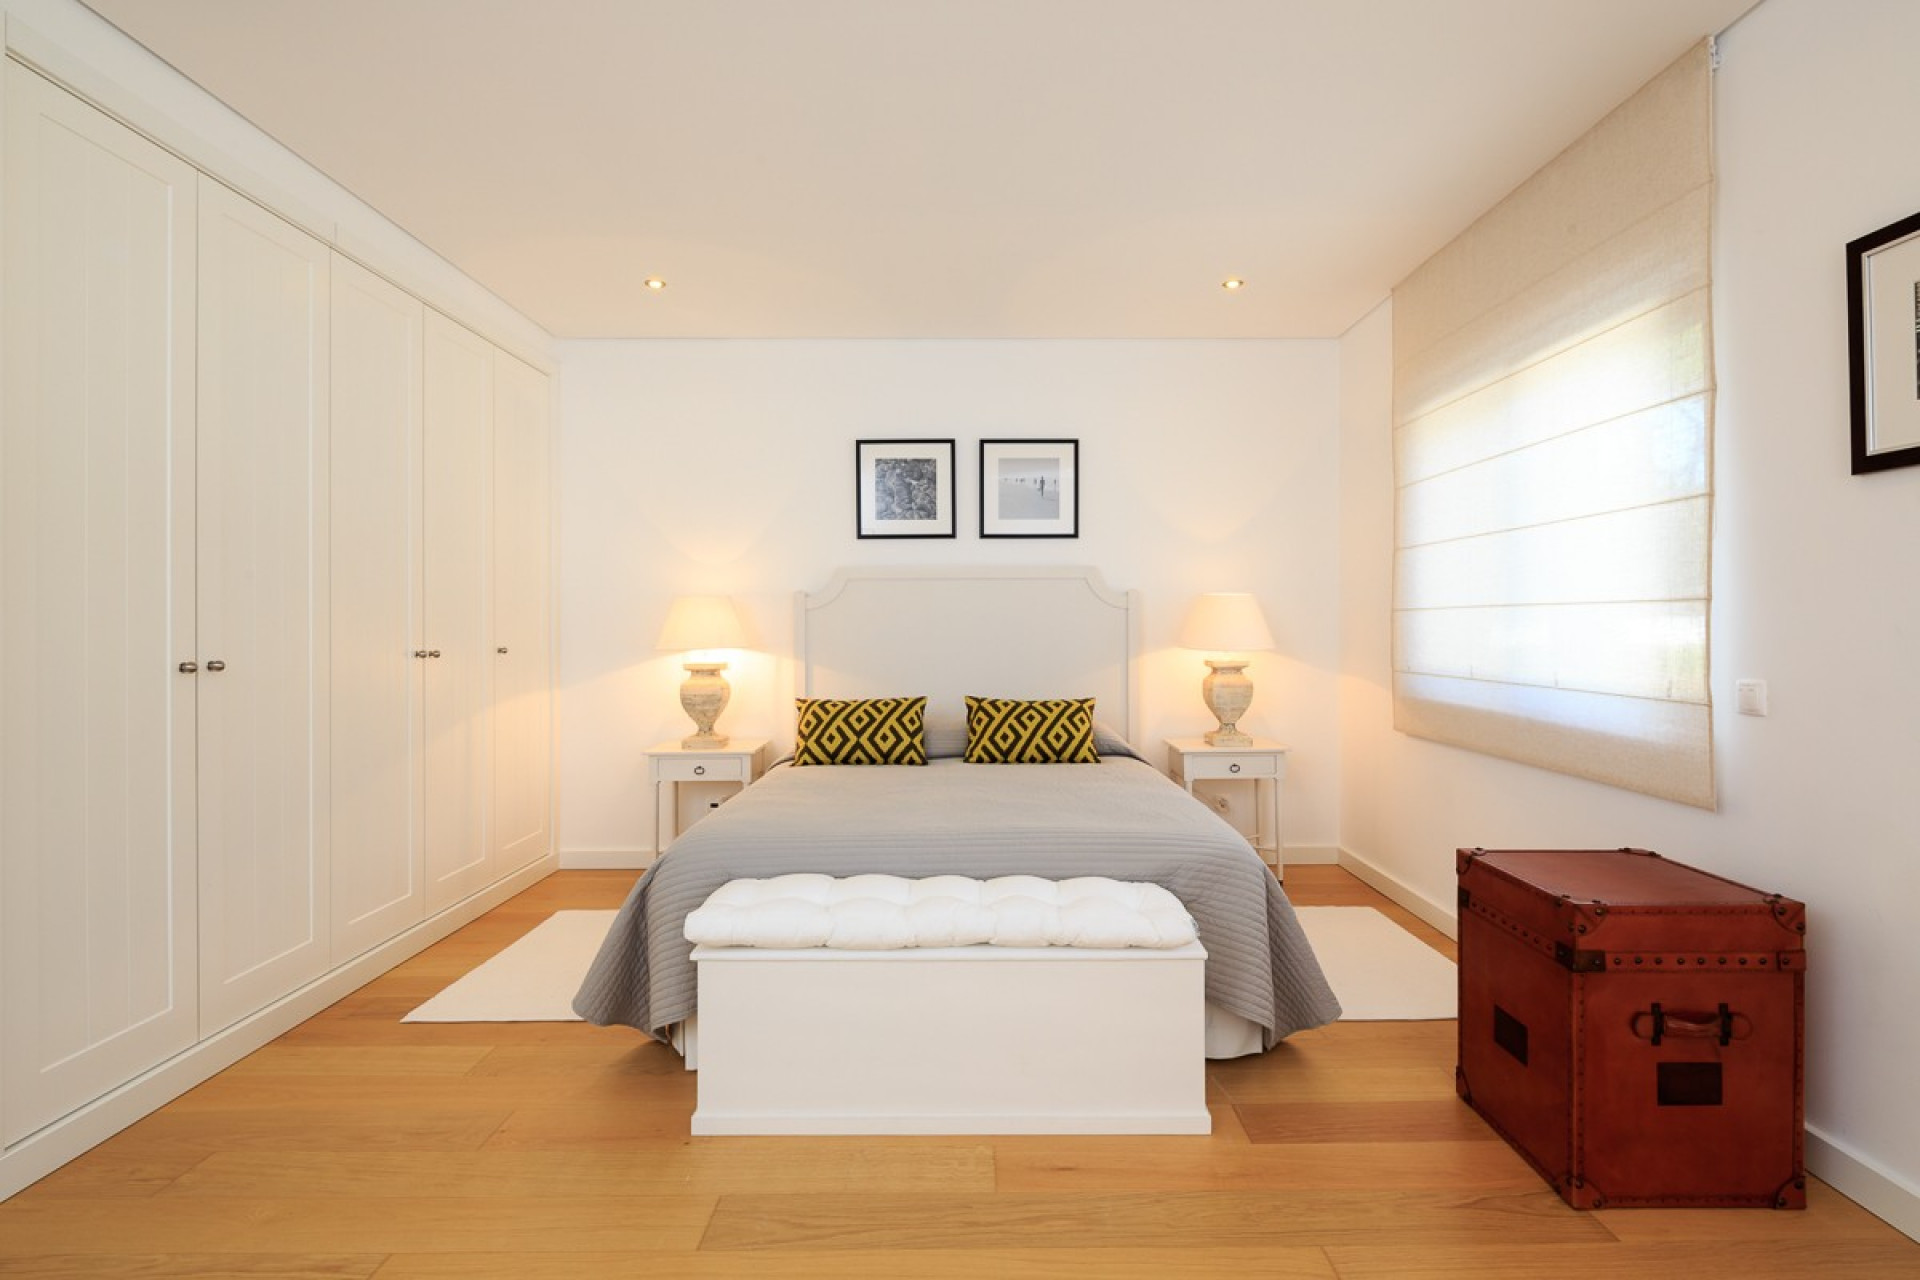 Luxury 5 Bedroom Villa Vilamoura Heated Infinity Pool Close To Golf